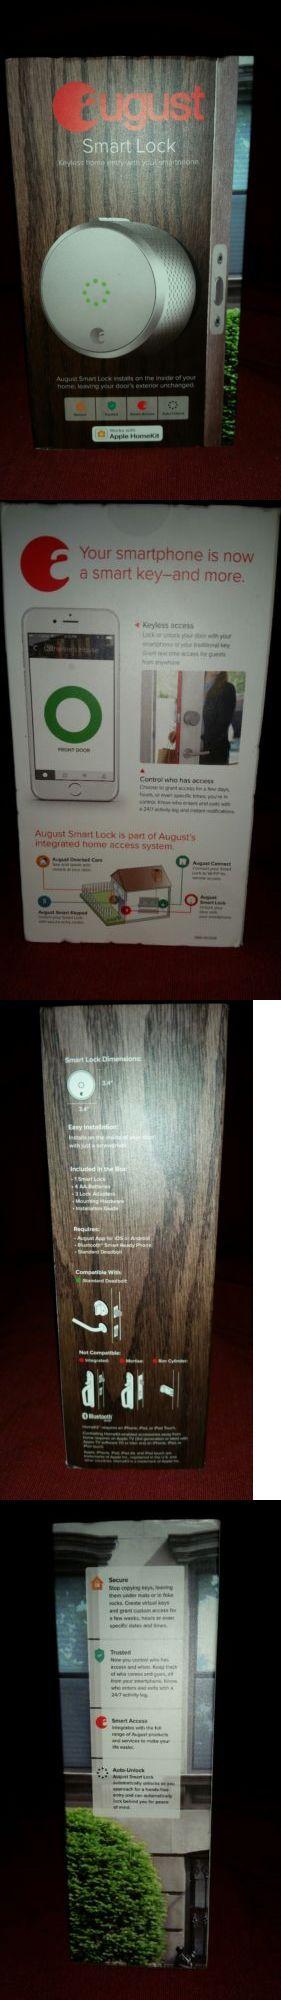 Door Locks and Lock Mechanisms 180966: August Smart Lock Keyless Home Entry W Apple Homekit – Silver - Version 2 -> BUY IT NOW ONLY: $139.99 on eBay!